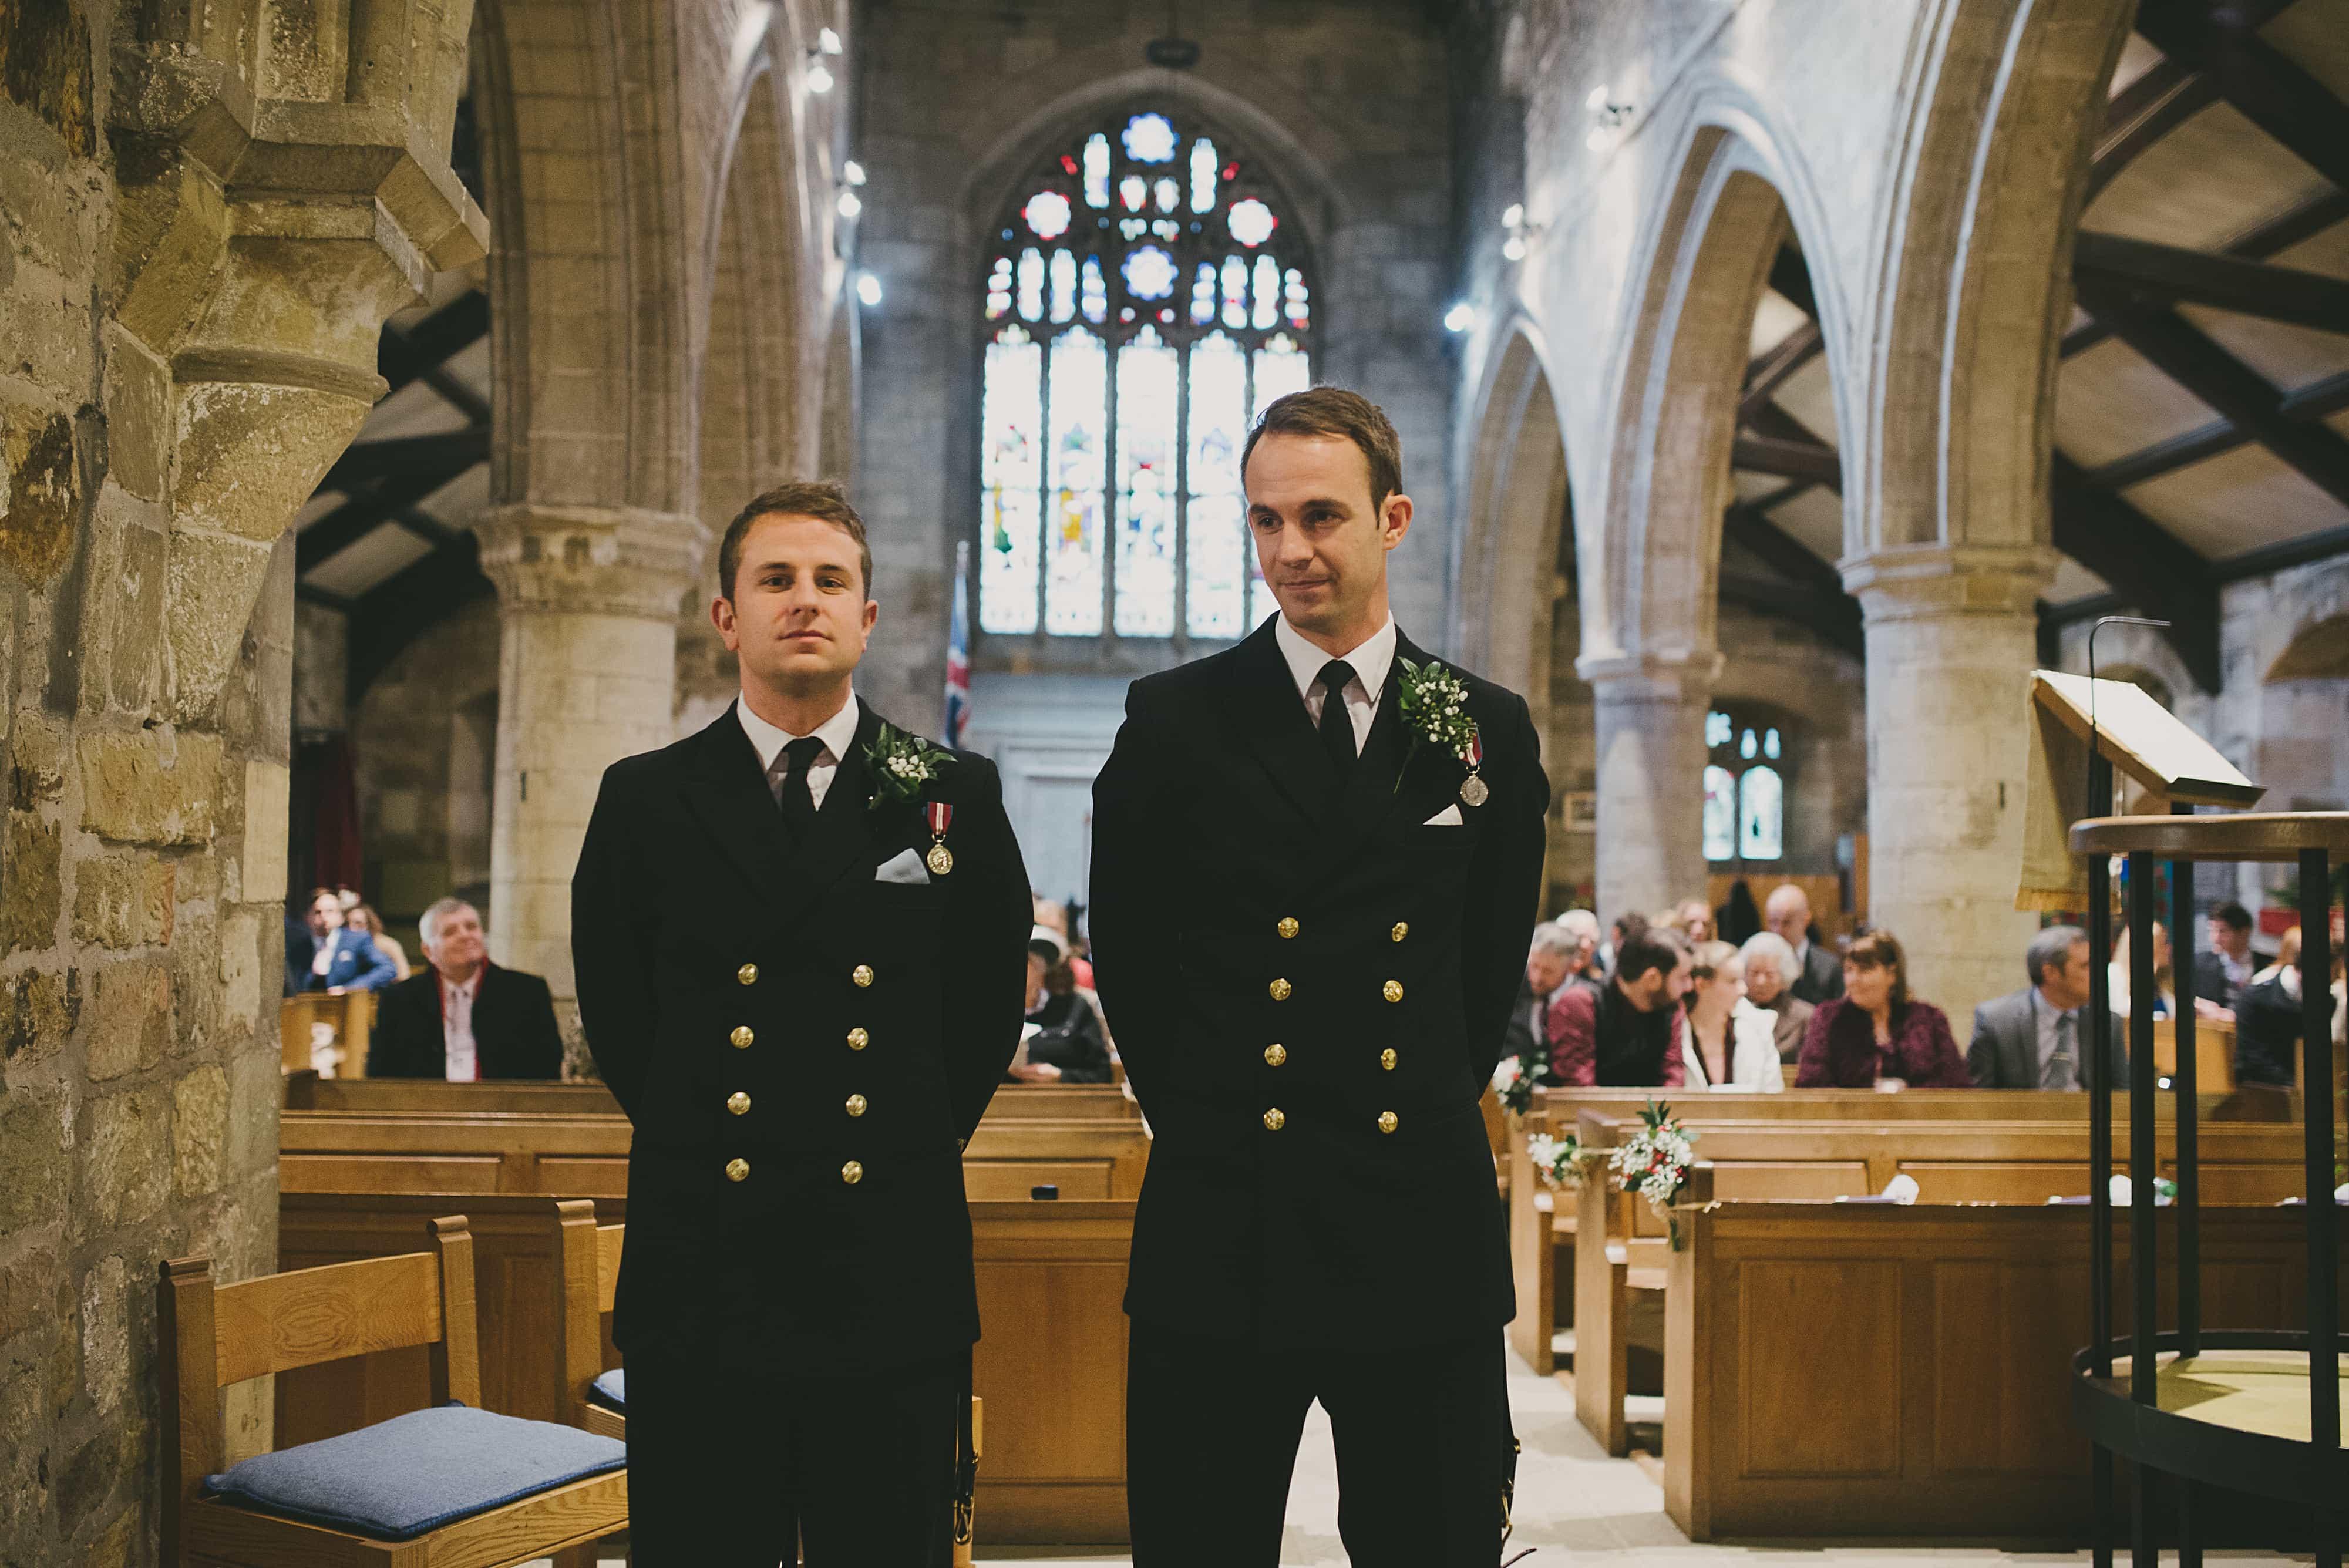 staffordshire-wedding-photographer-16